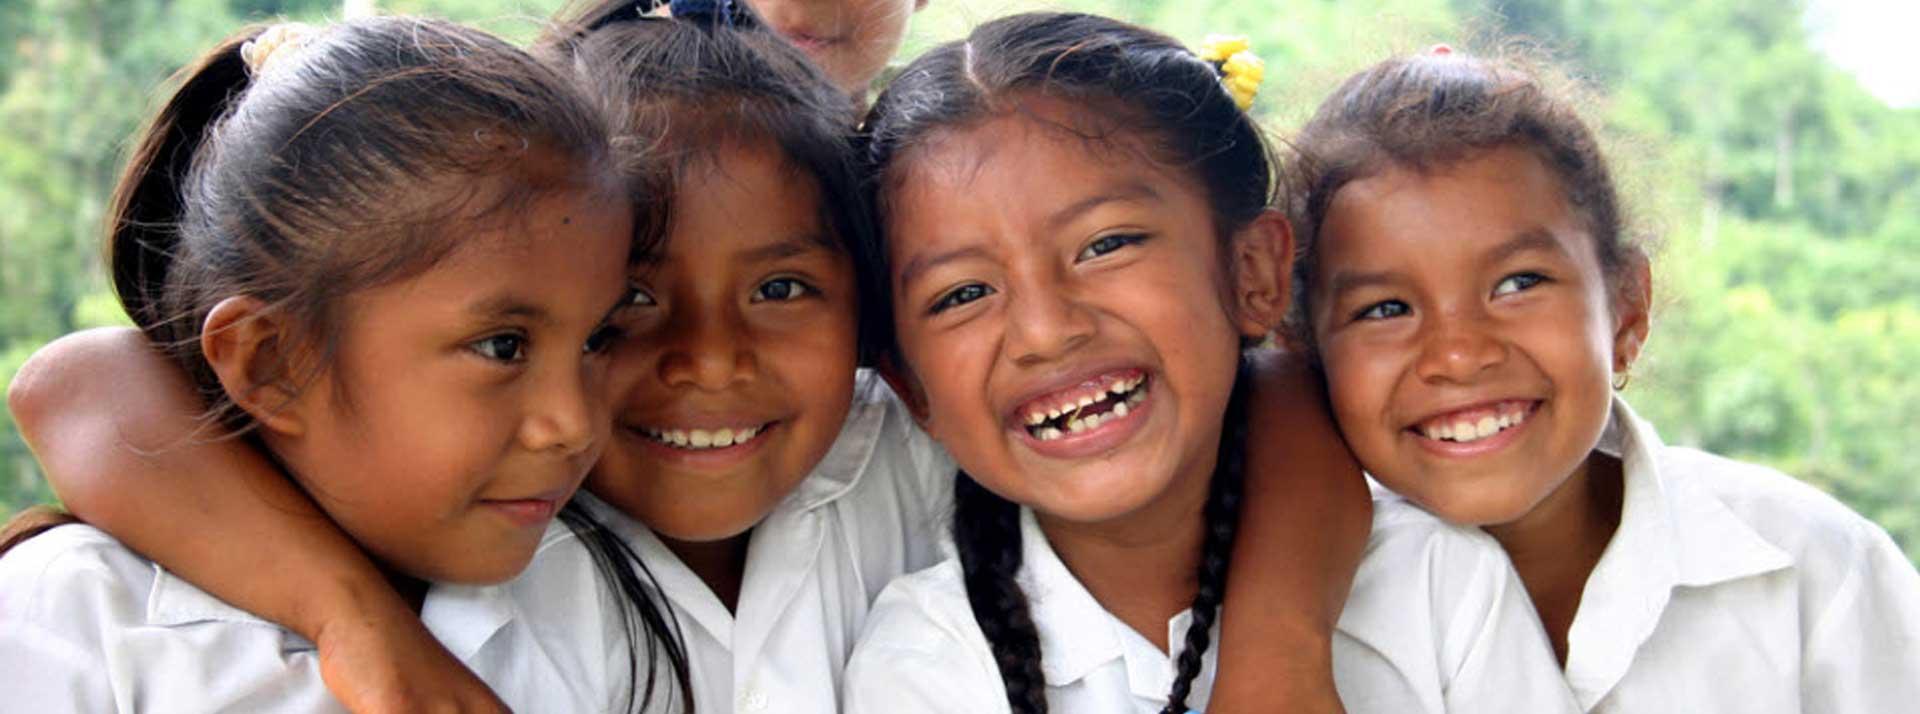 Change a Life Through Education